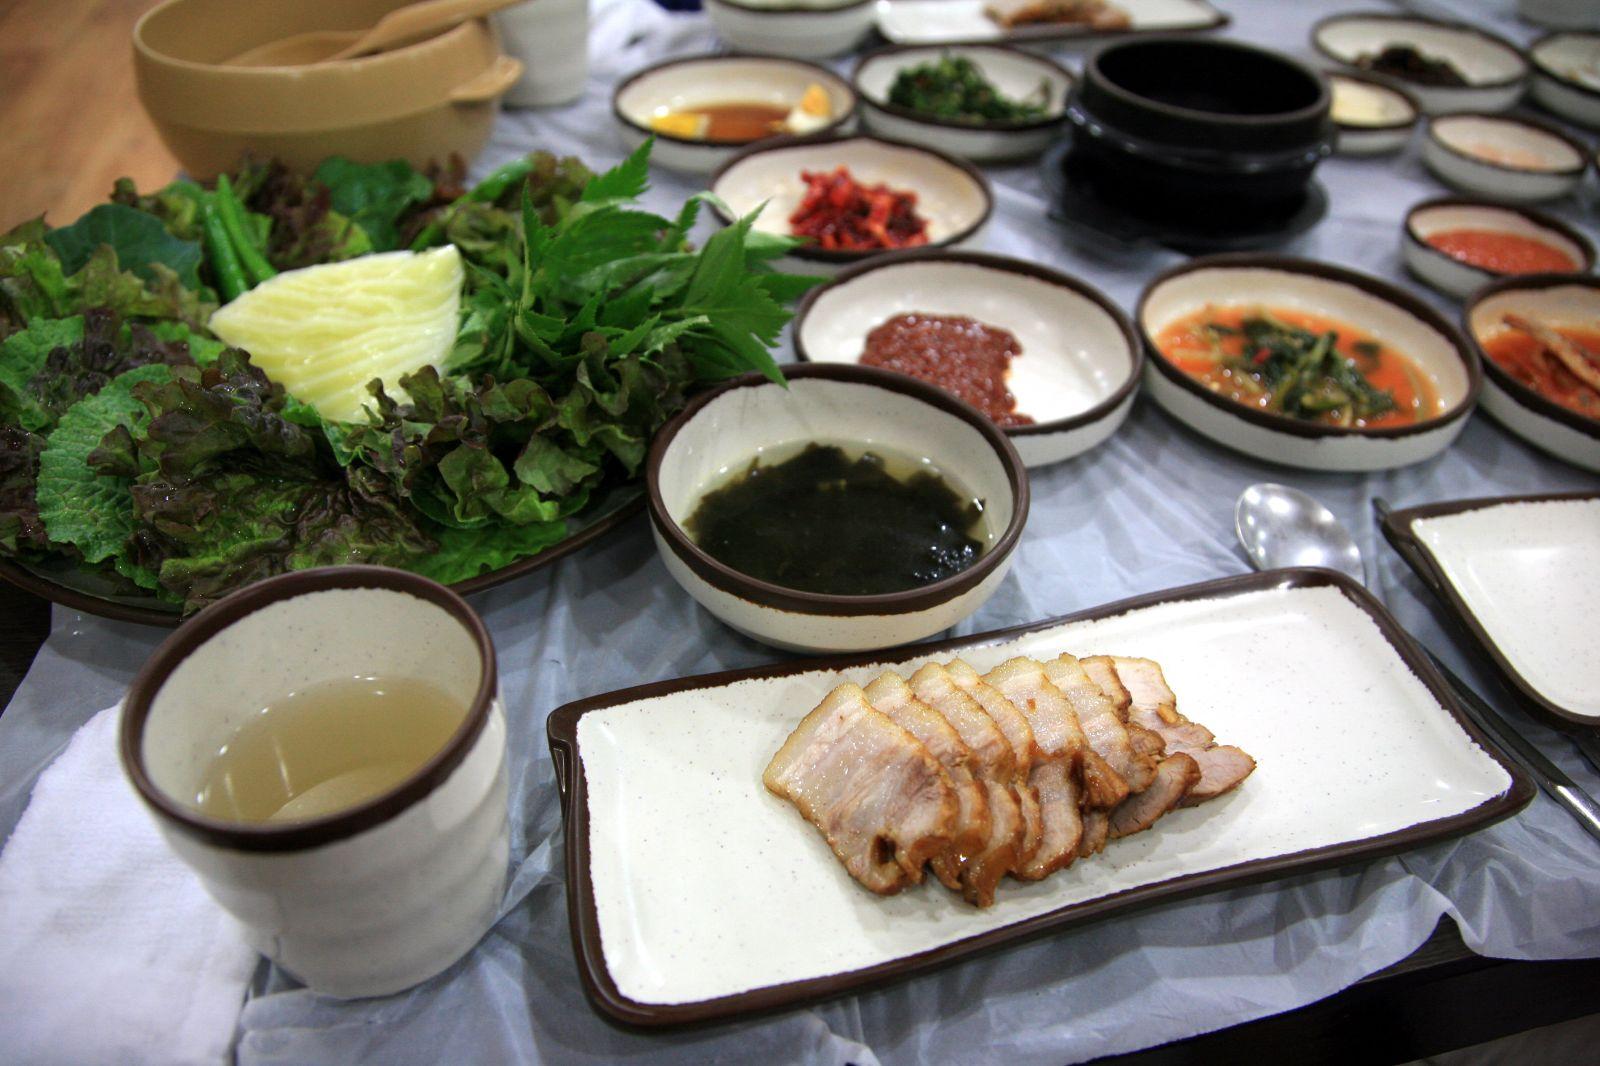 Bossam food wikipedia for Cuisine wikipedia